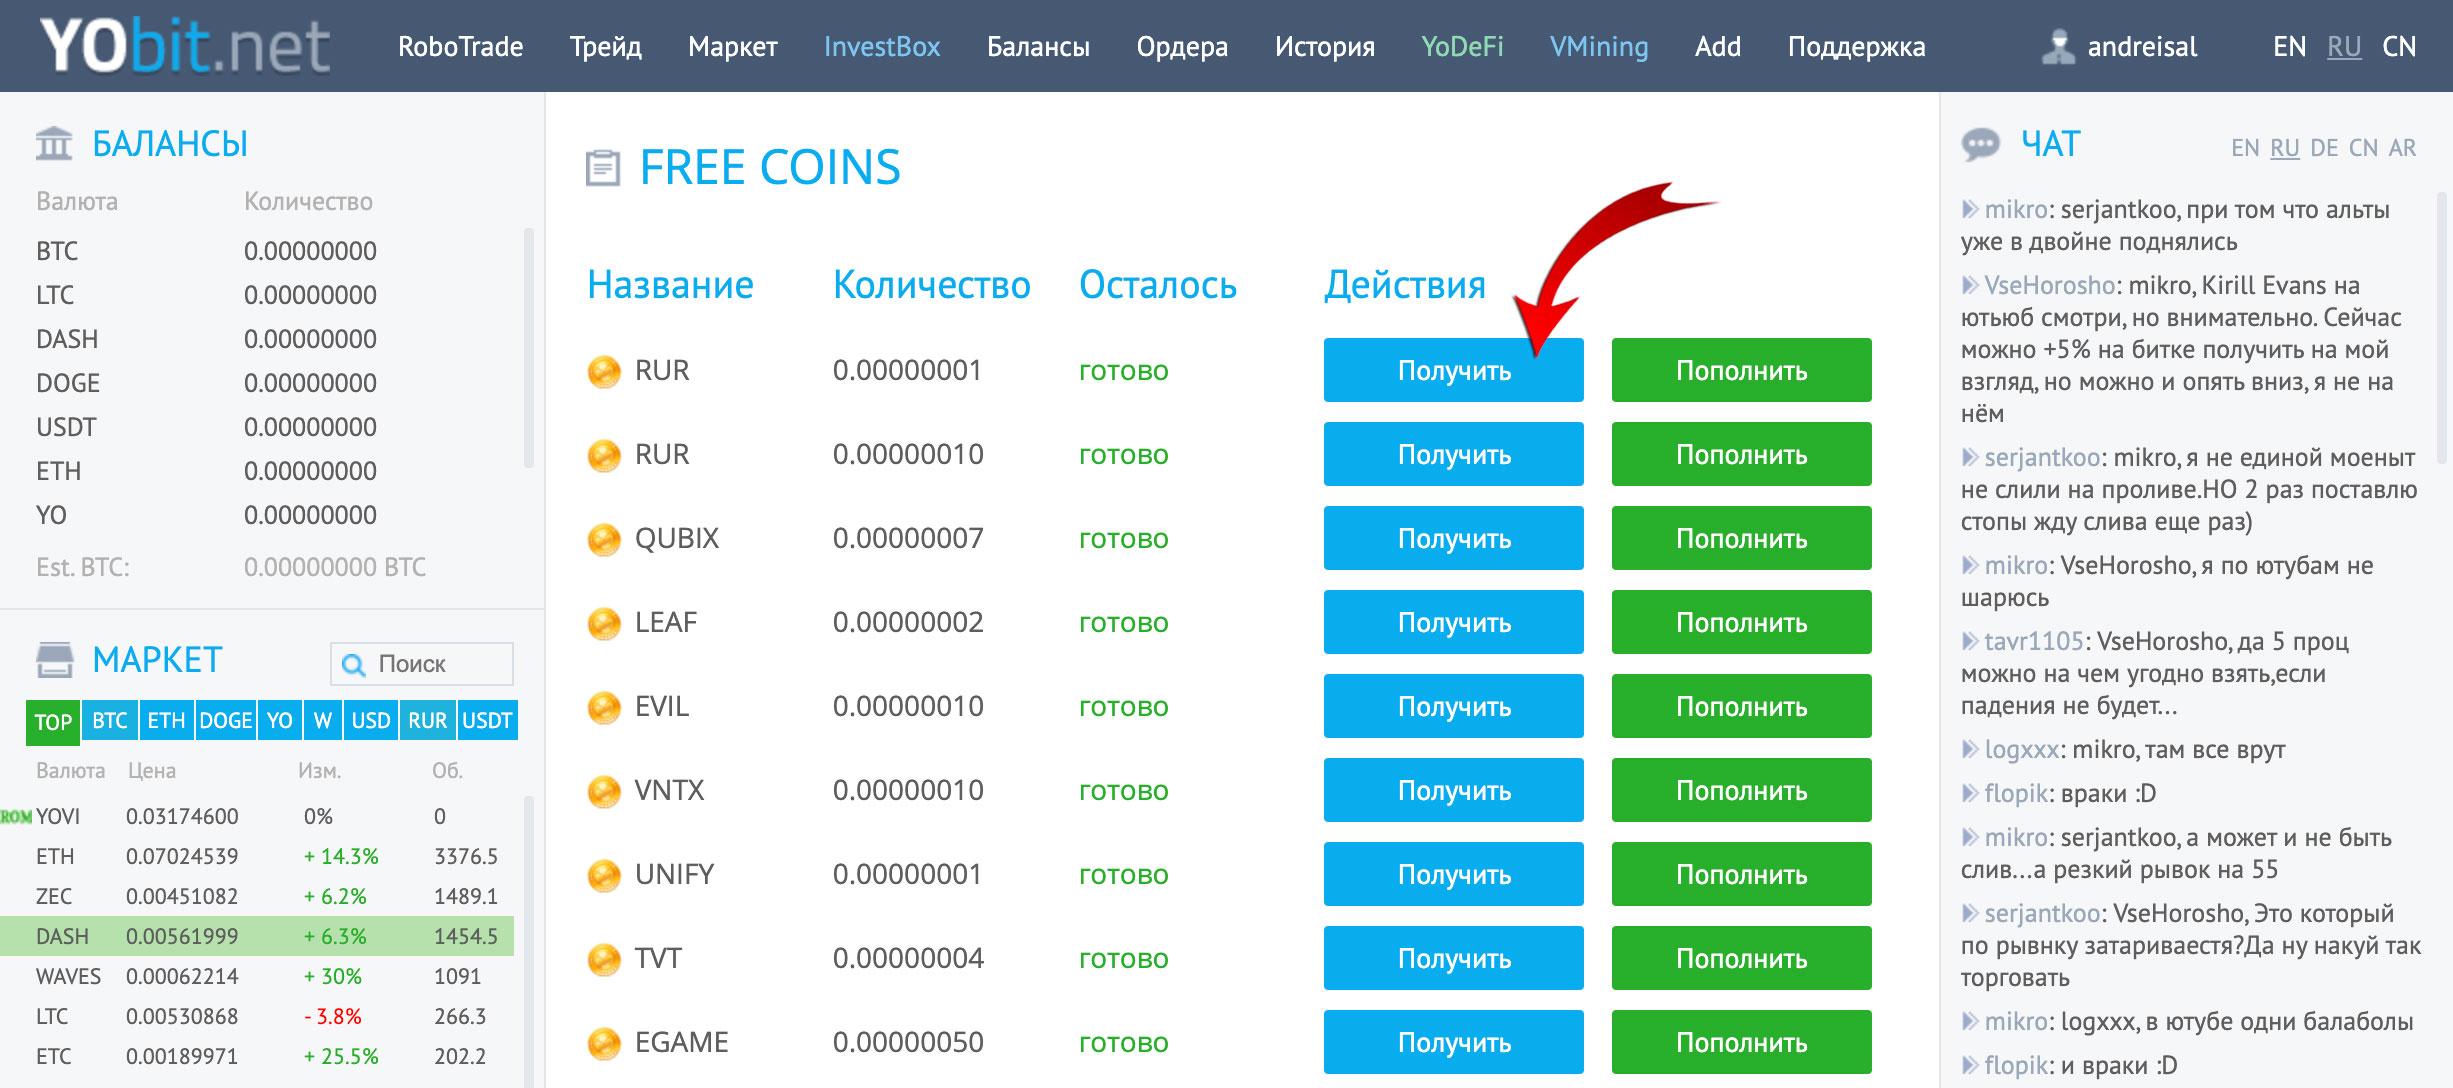 yobit free coins